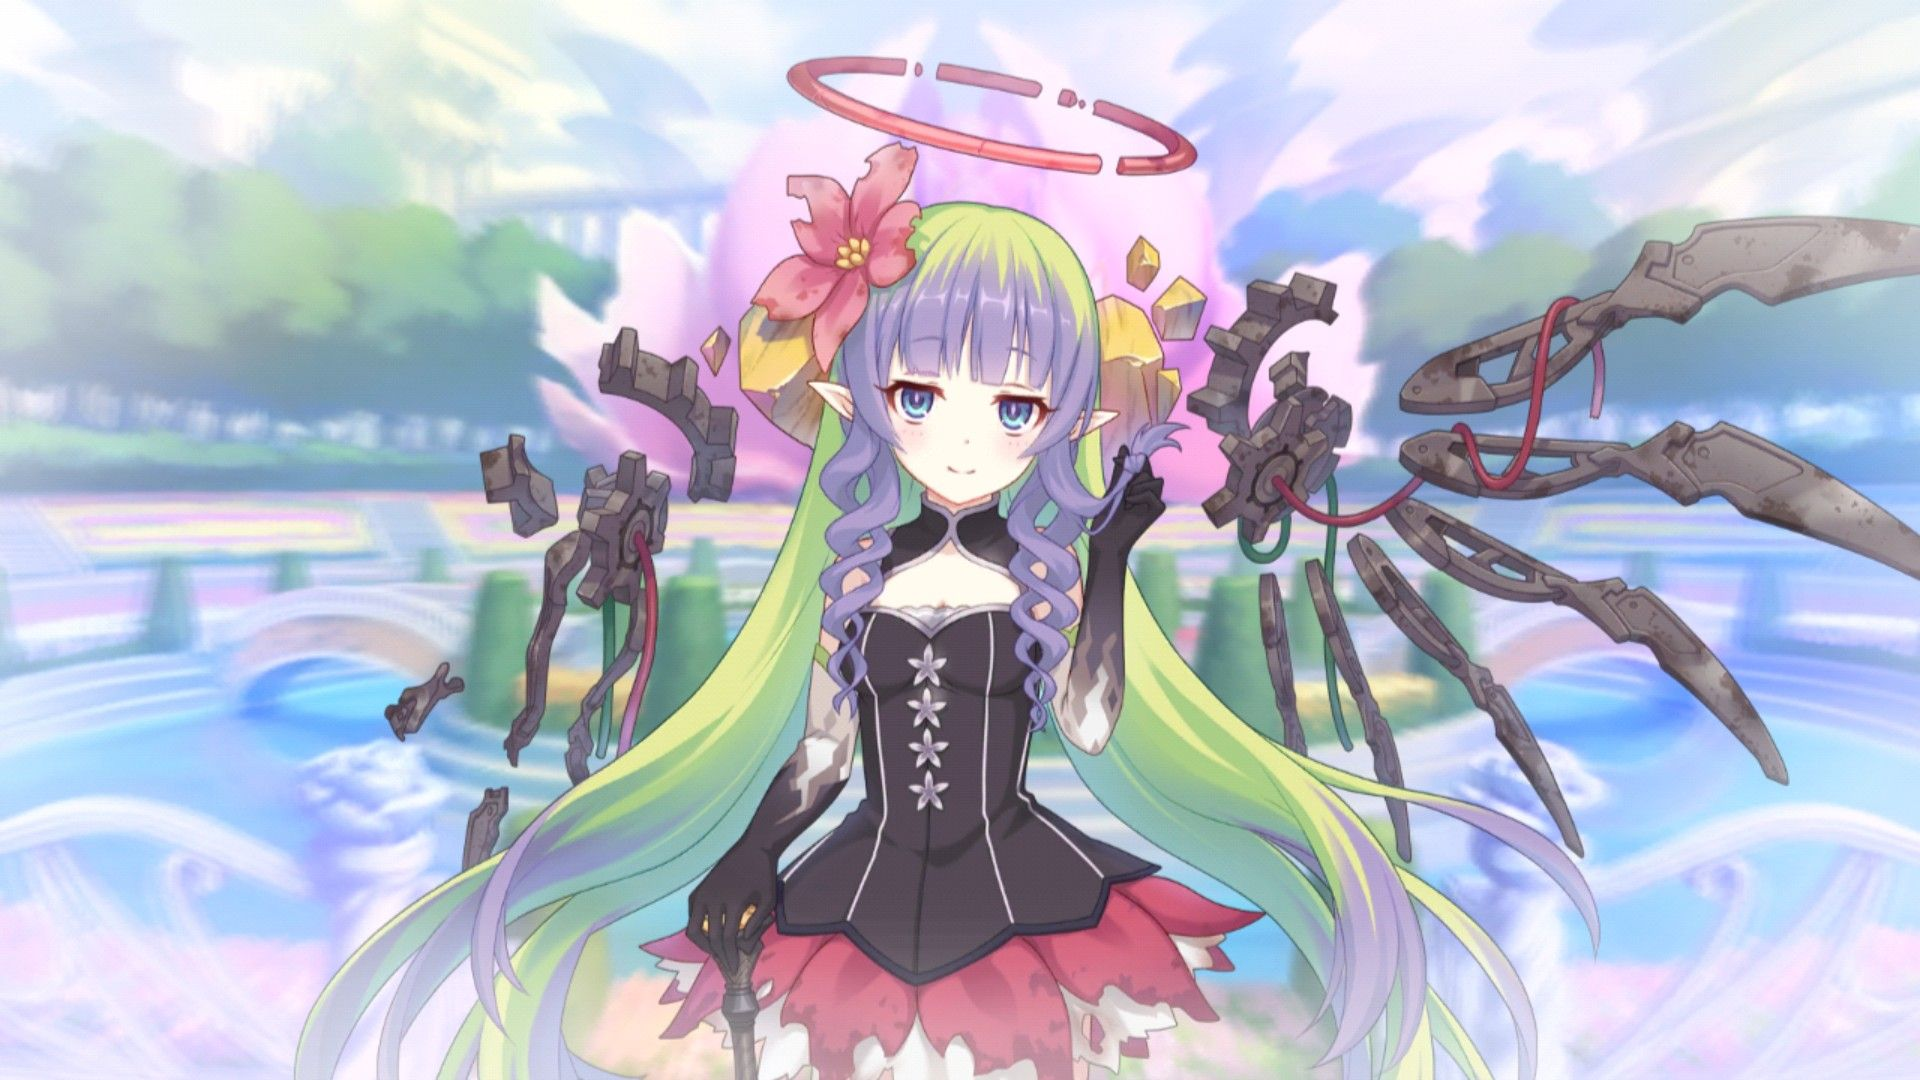 Pin by Kuroko Tetsuya on Princess Connect! Anime, Zelda